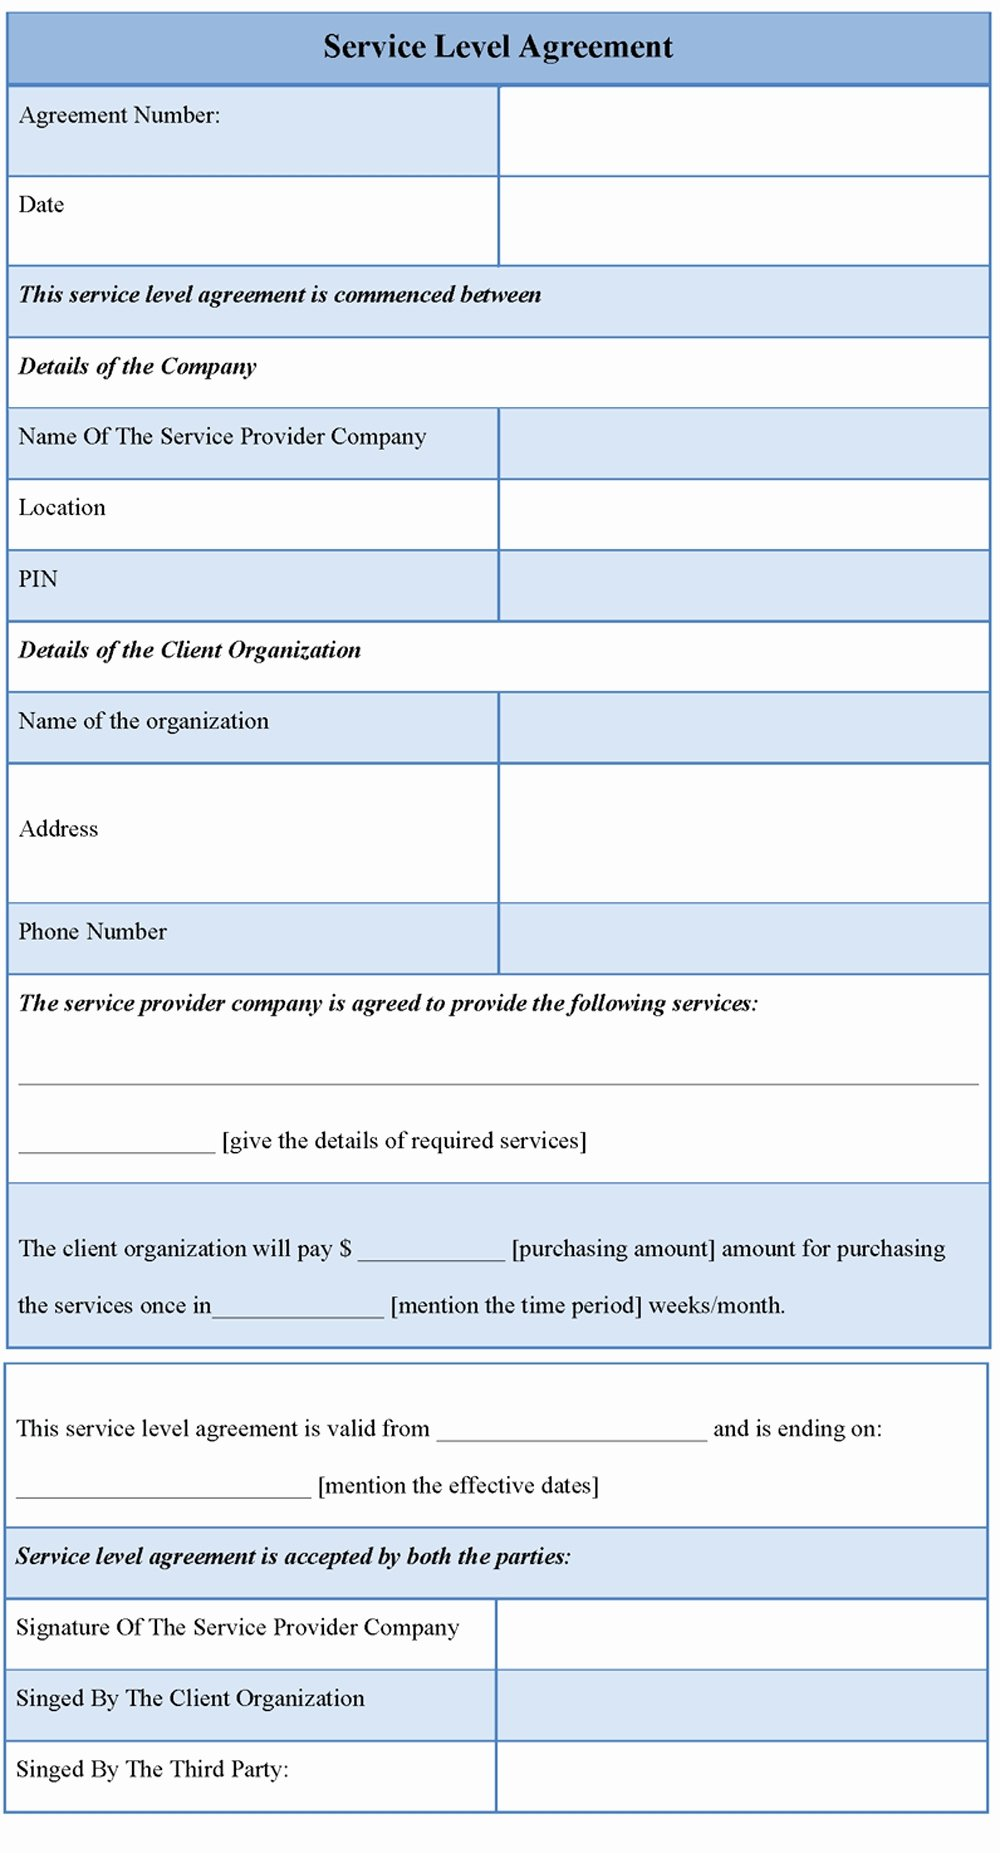 Internal Service Level Agreement Template Luxury Service Level Agreement format